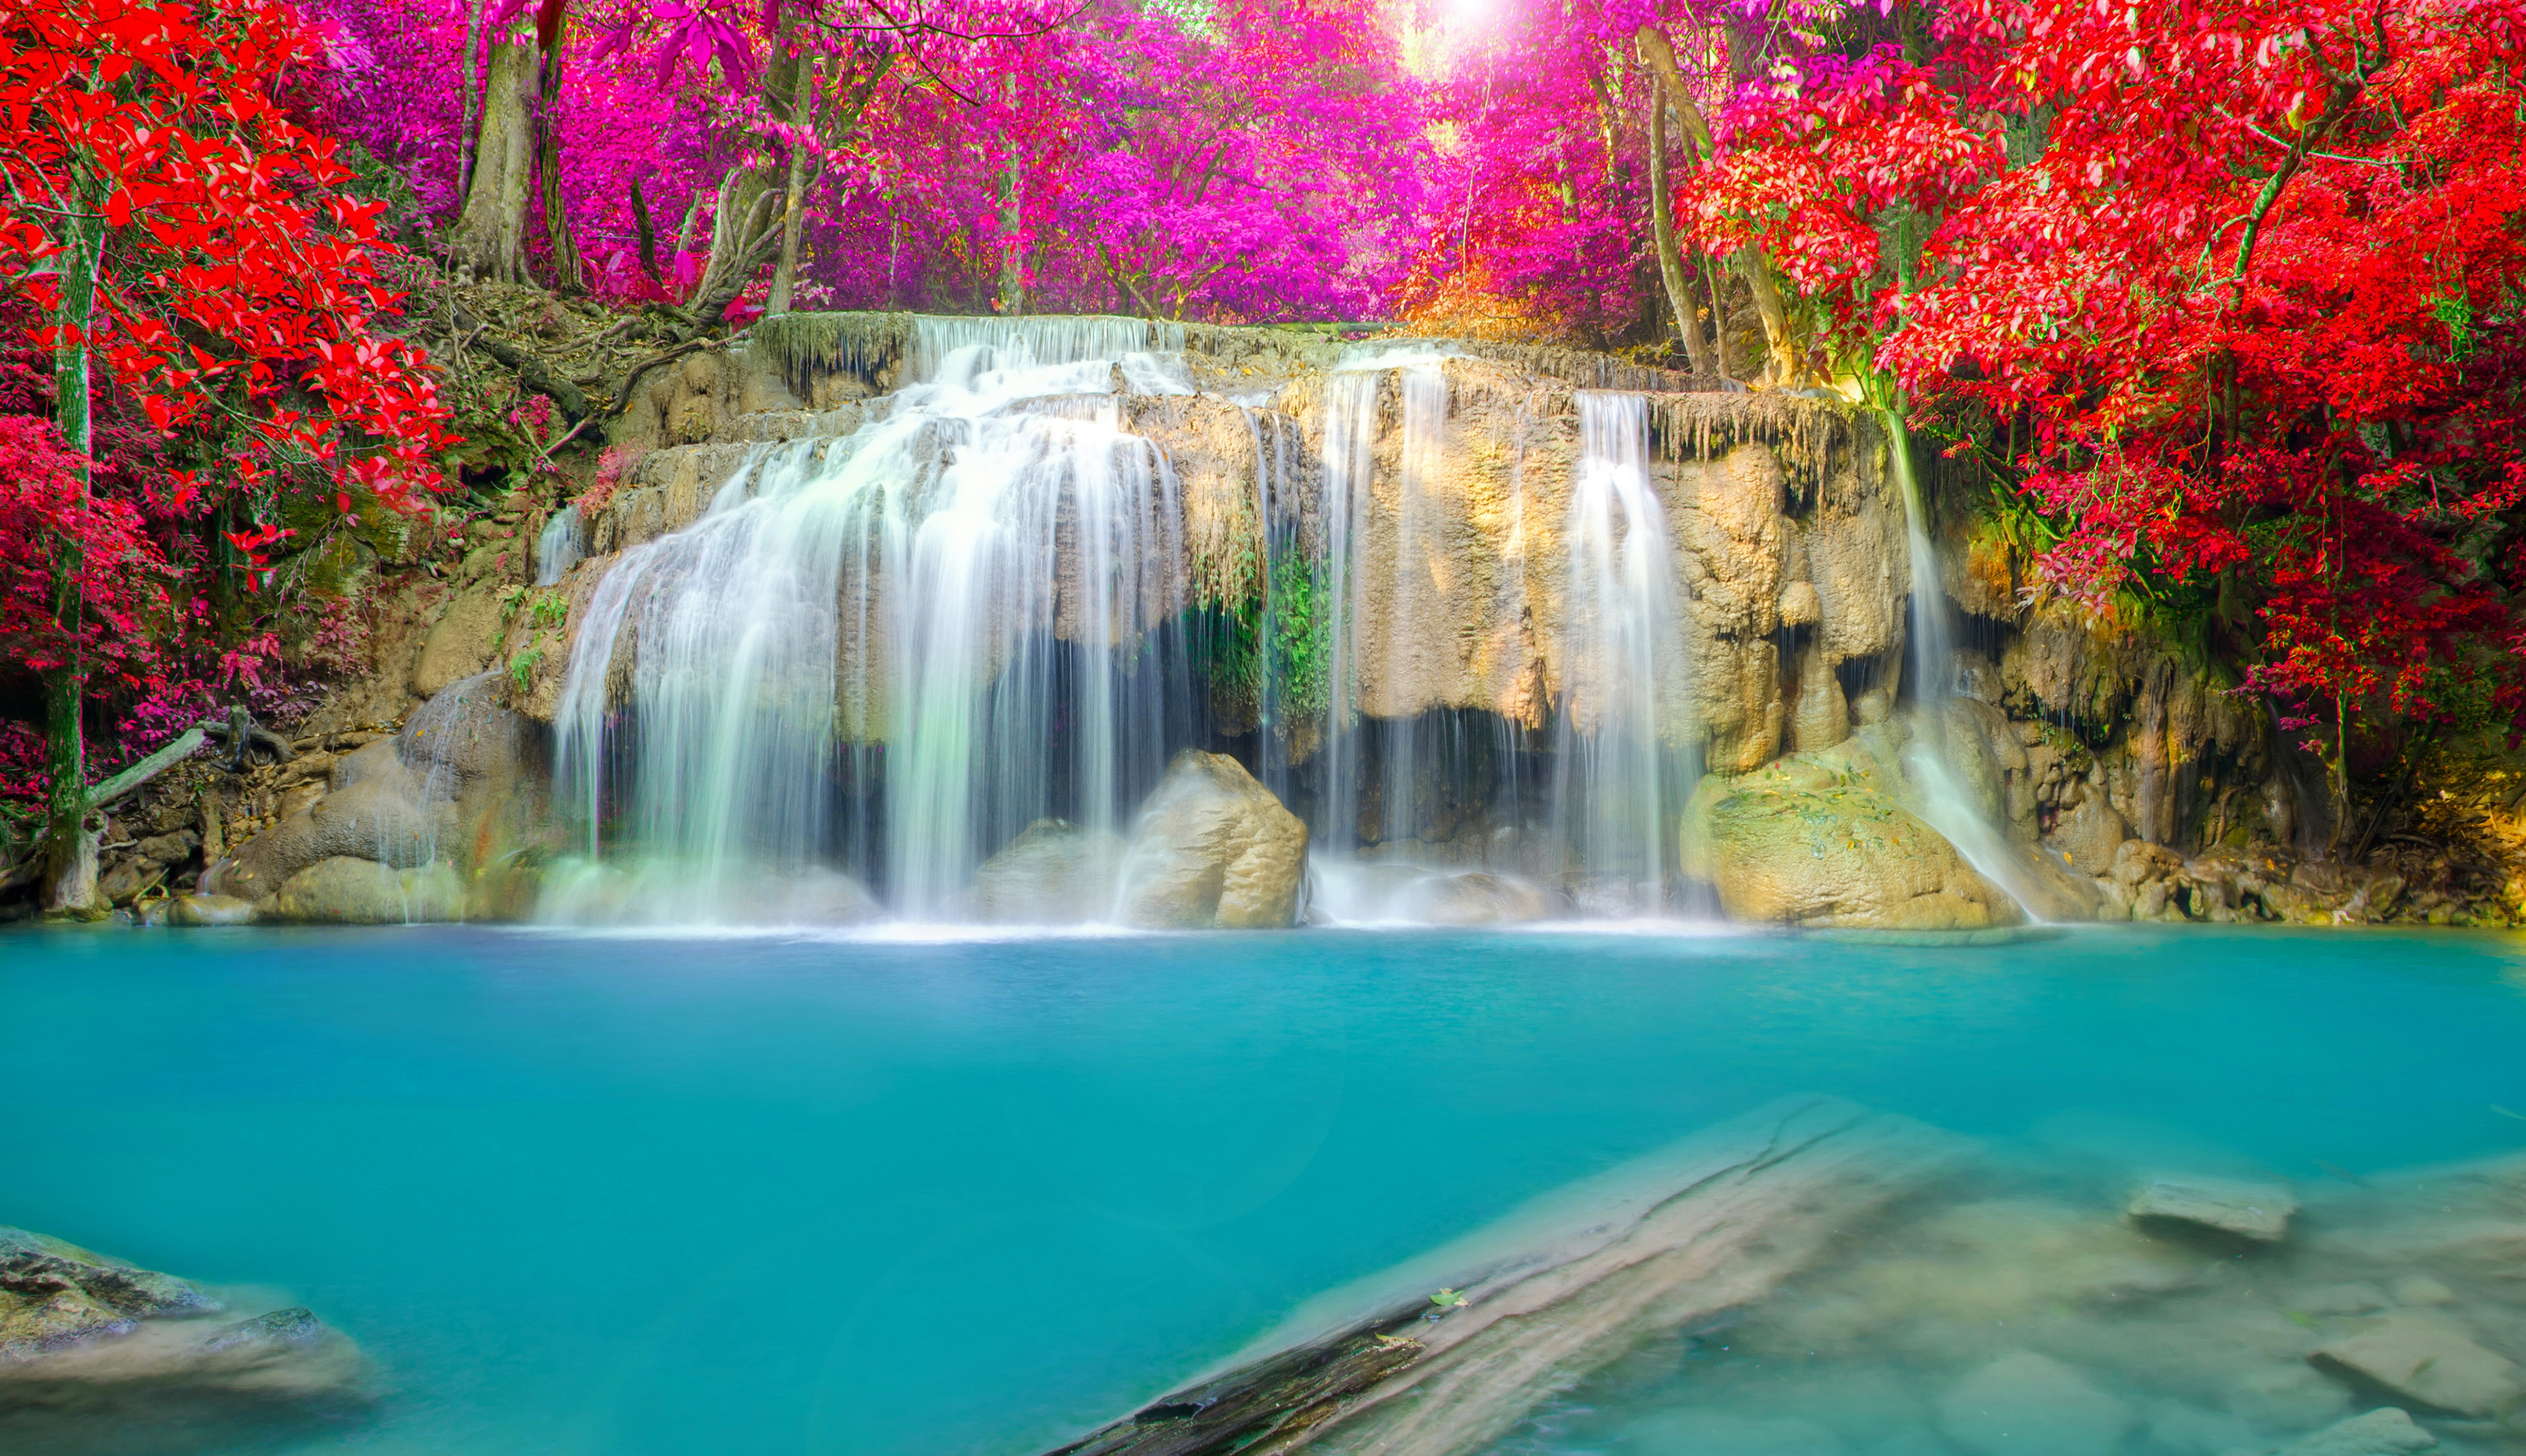 thailand parks waterfalls erawan waterfall national park nature